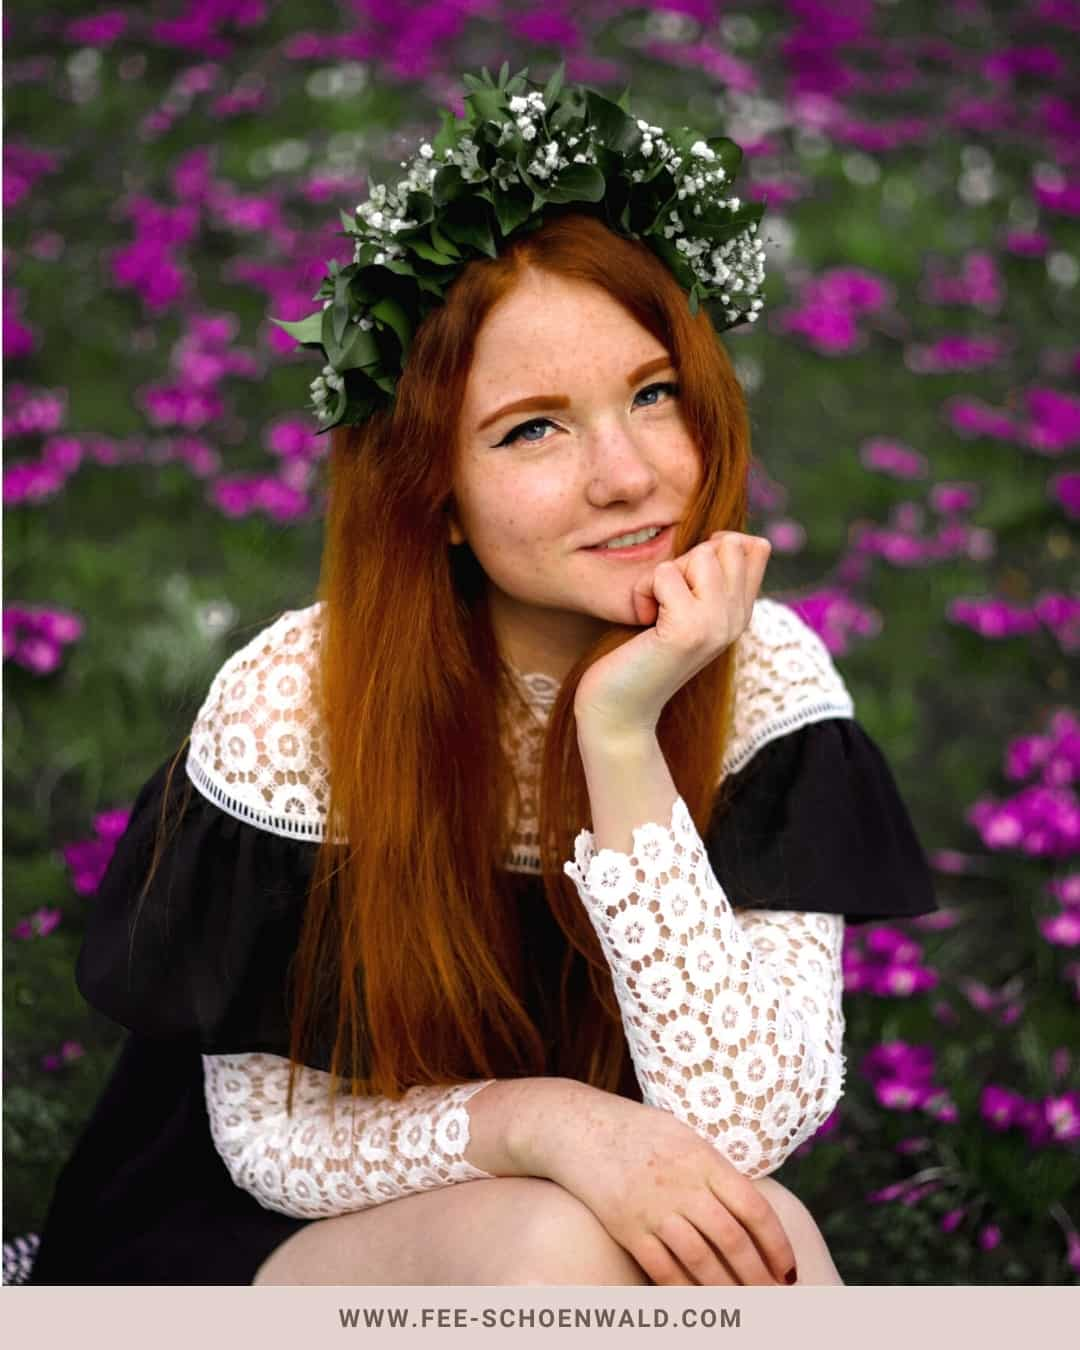 Blumenbild Fee Schoenwald